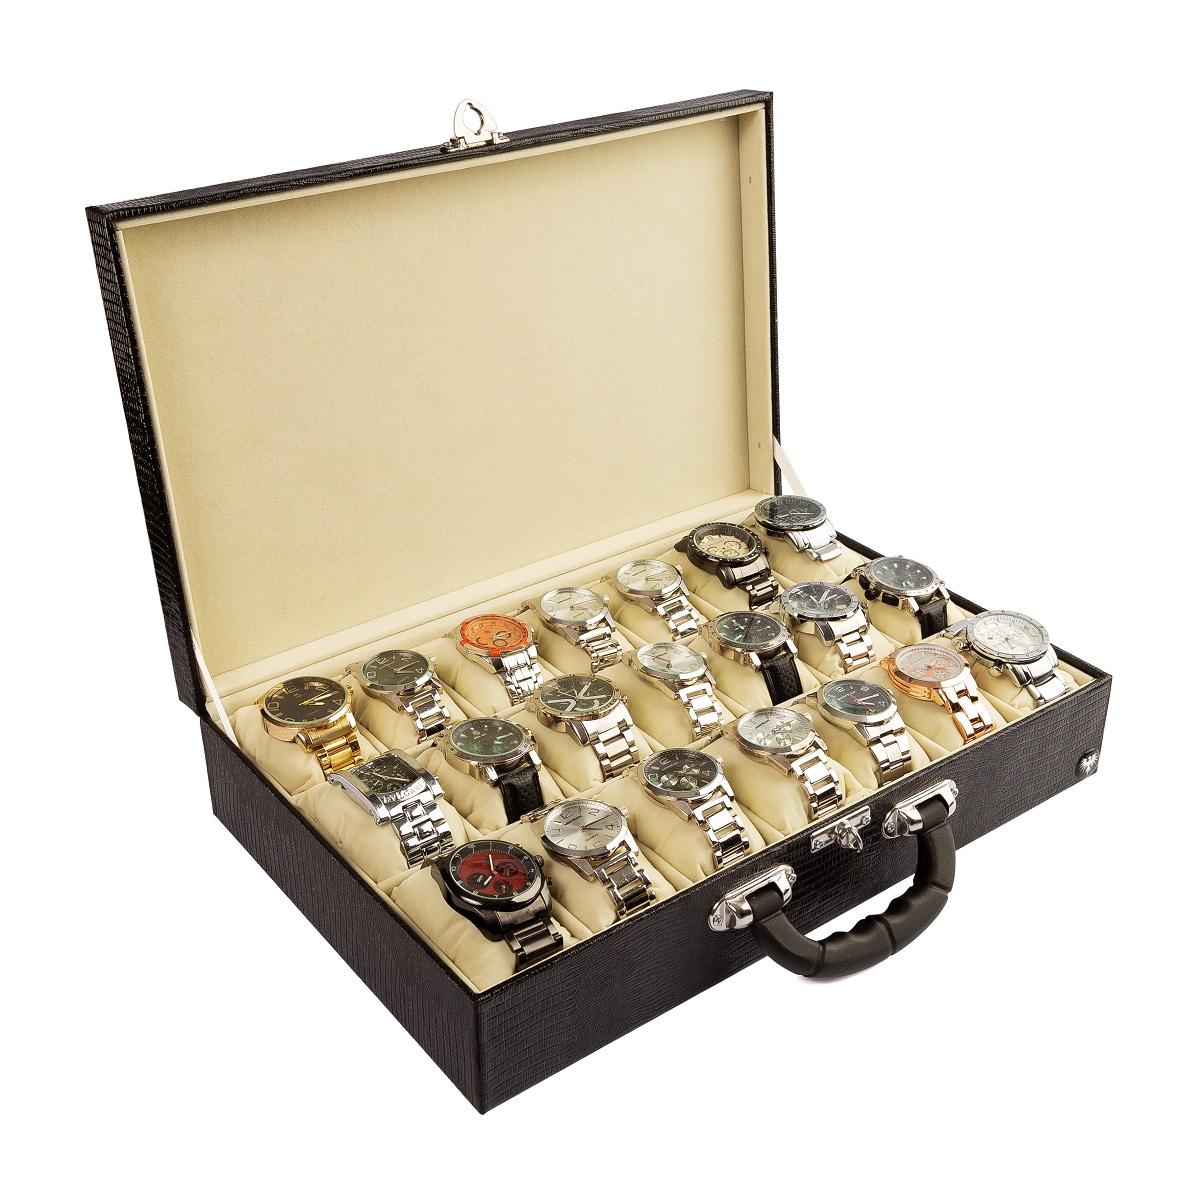 maleta-porta-relogio-21-nichos-couro-ecologico-preto-bege-imagem-8.jpg